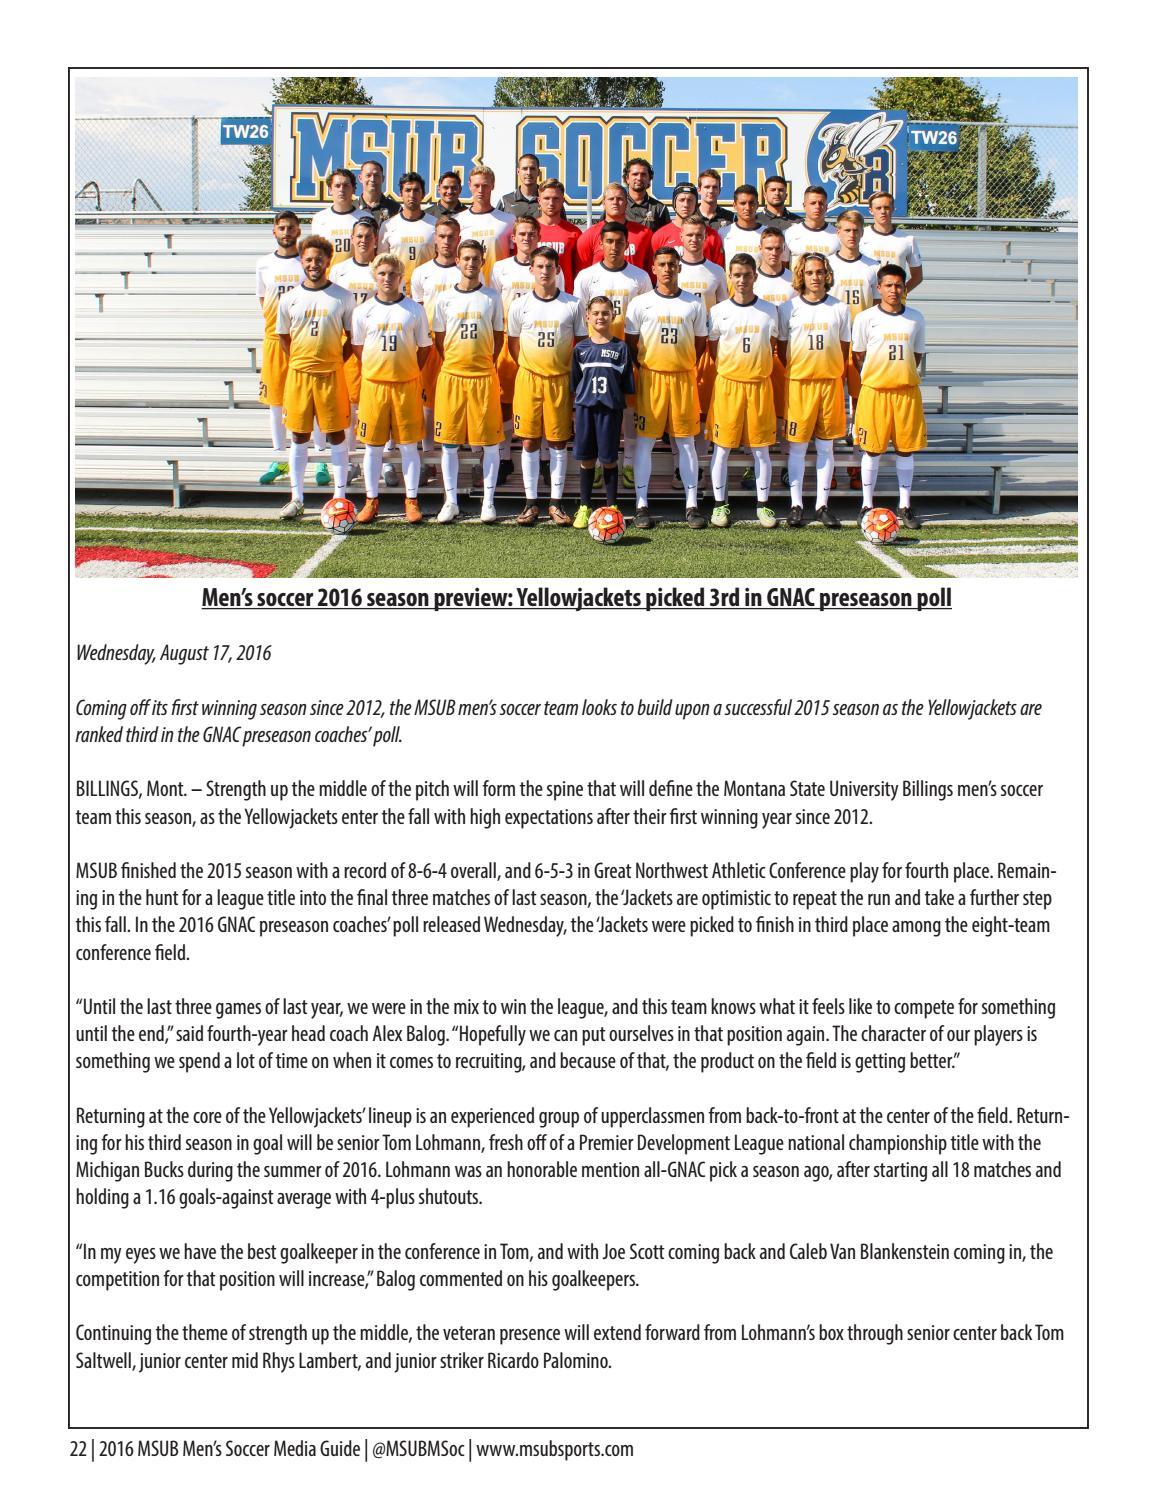 MSUB Men's Soccer 2016 Media Guide by MSUB Sports - issuu